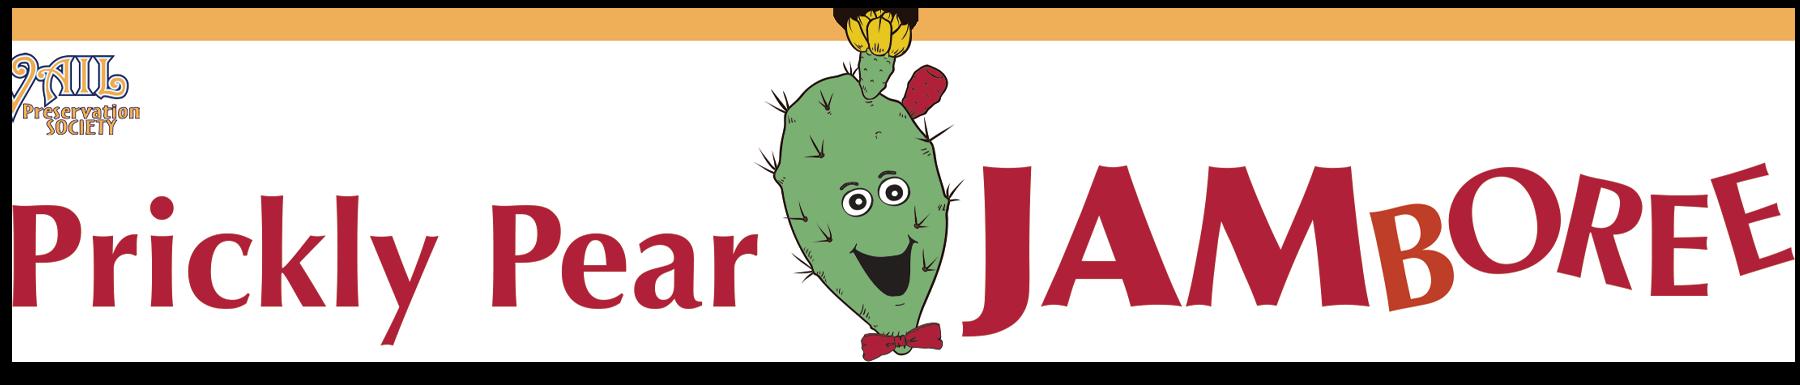 Prickly Pear Jamboree Logo